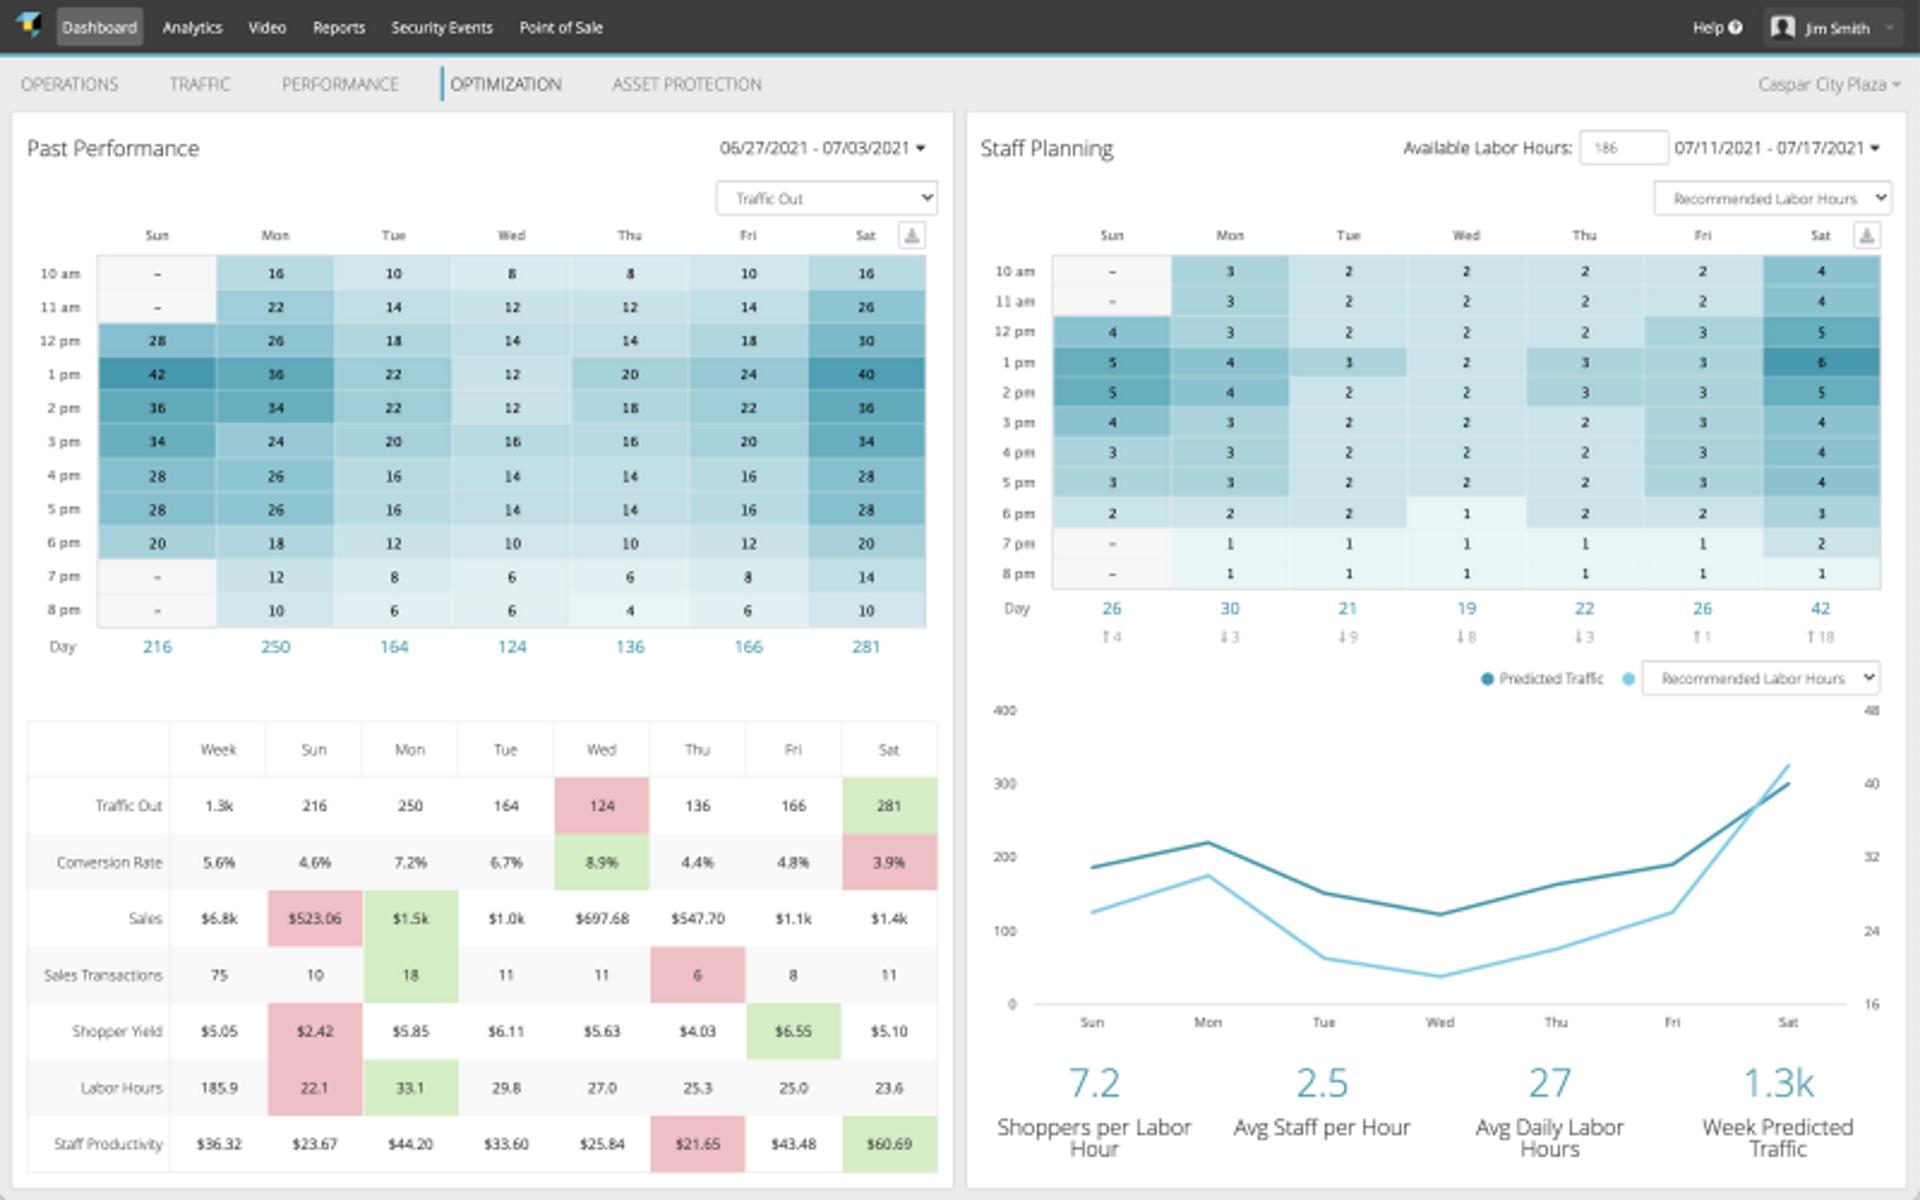 Retailnext analytics